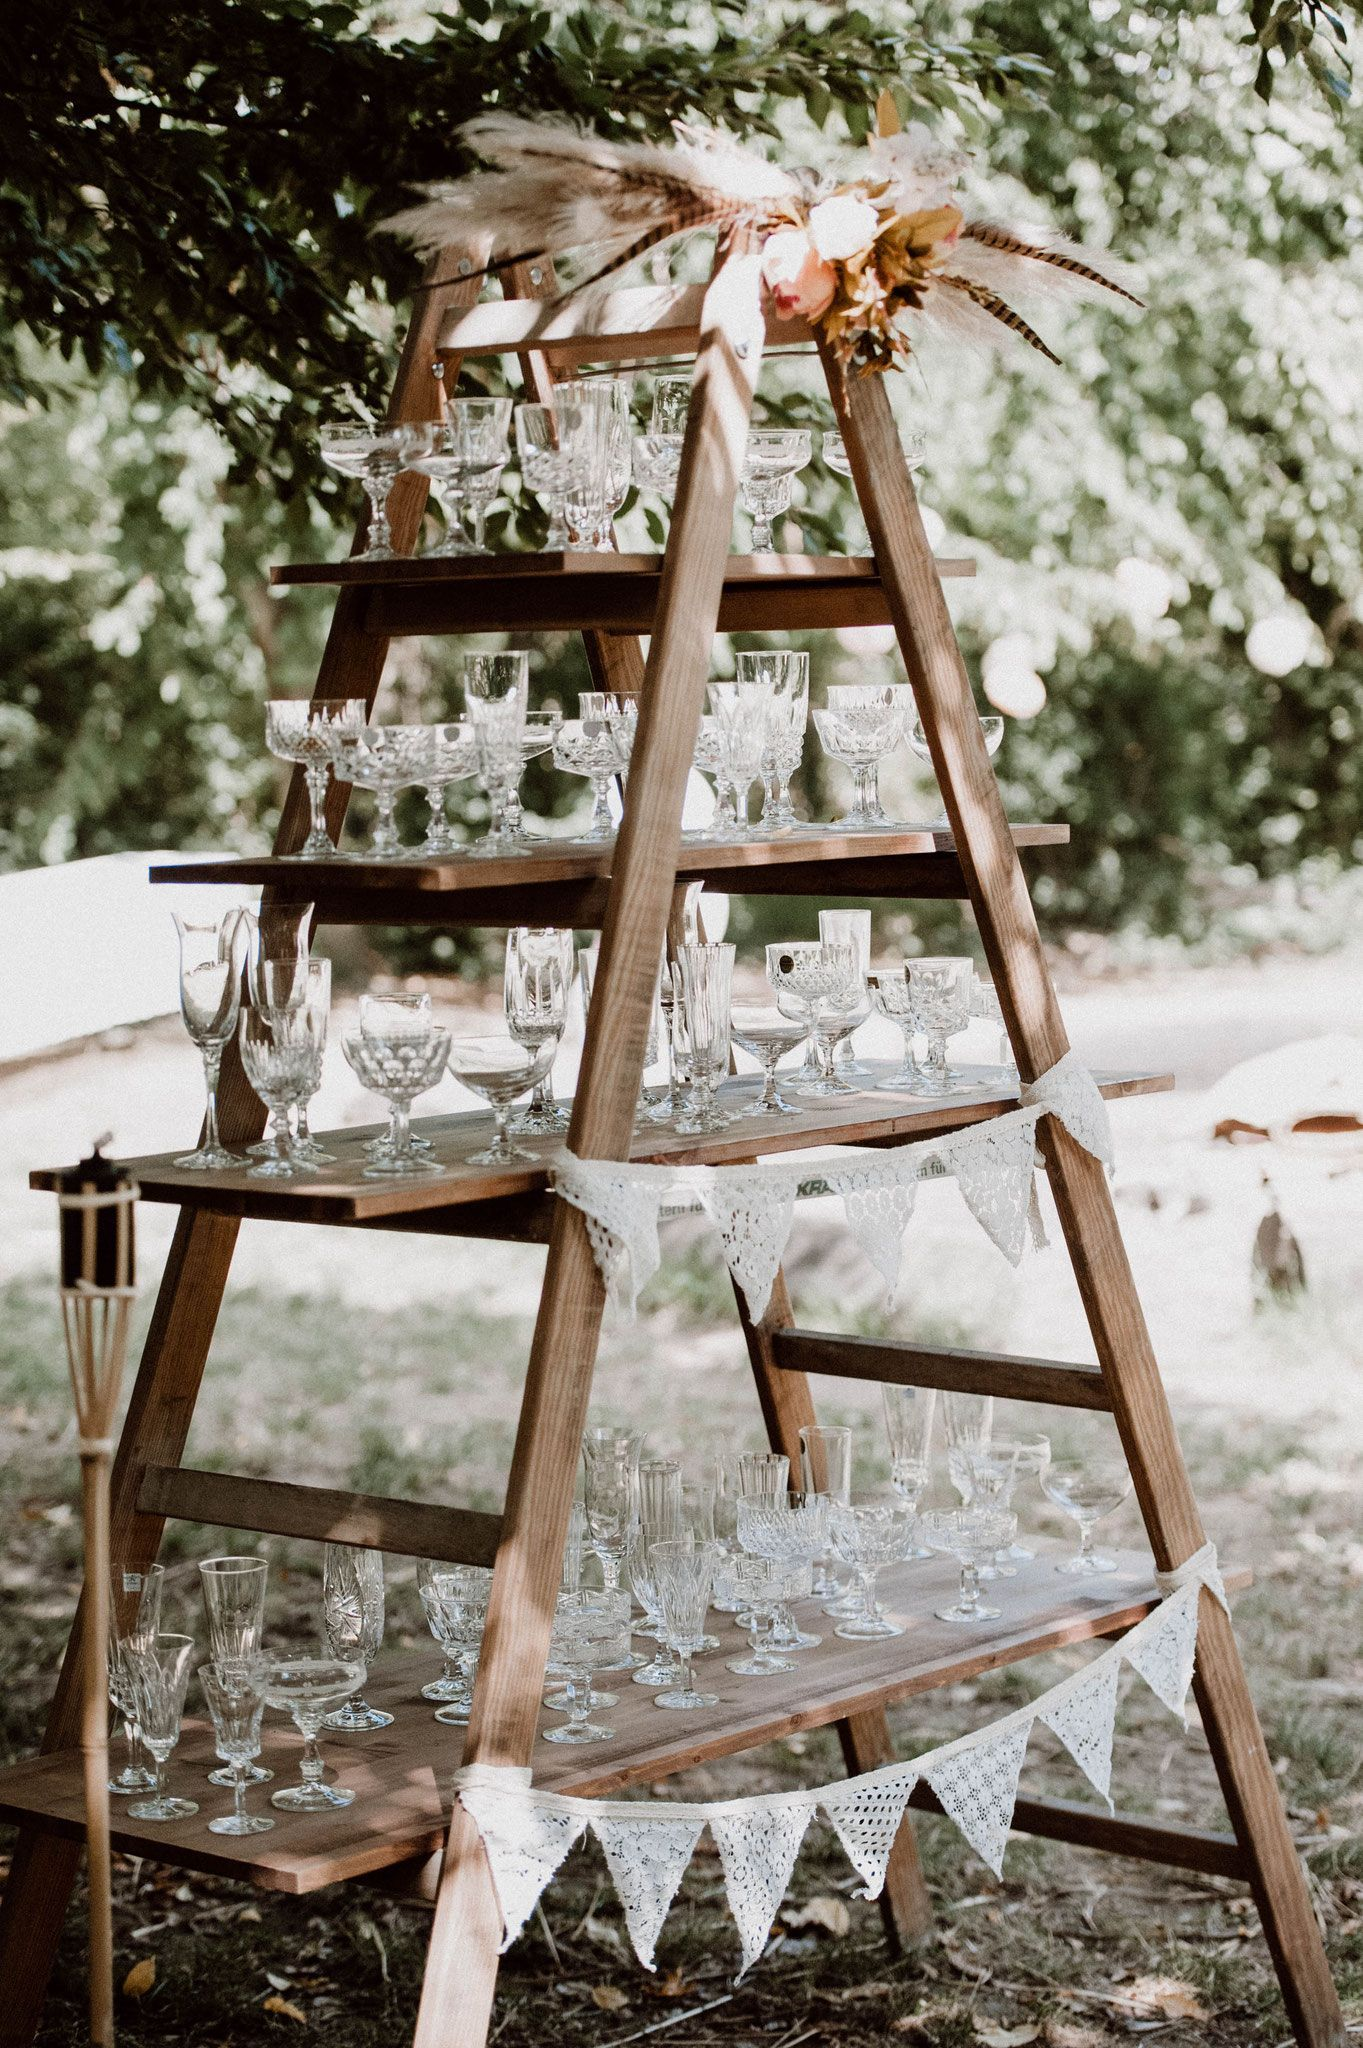 Lyqqurbjwqrcxkcxoalpmavuoqnfezevuuhnhjkeueccqwtwql Vintage Boho Wedding Wedding Deco Boho Wedding Decorations